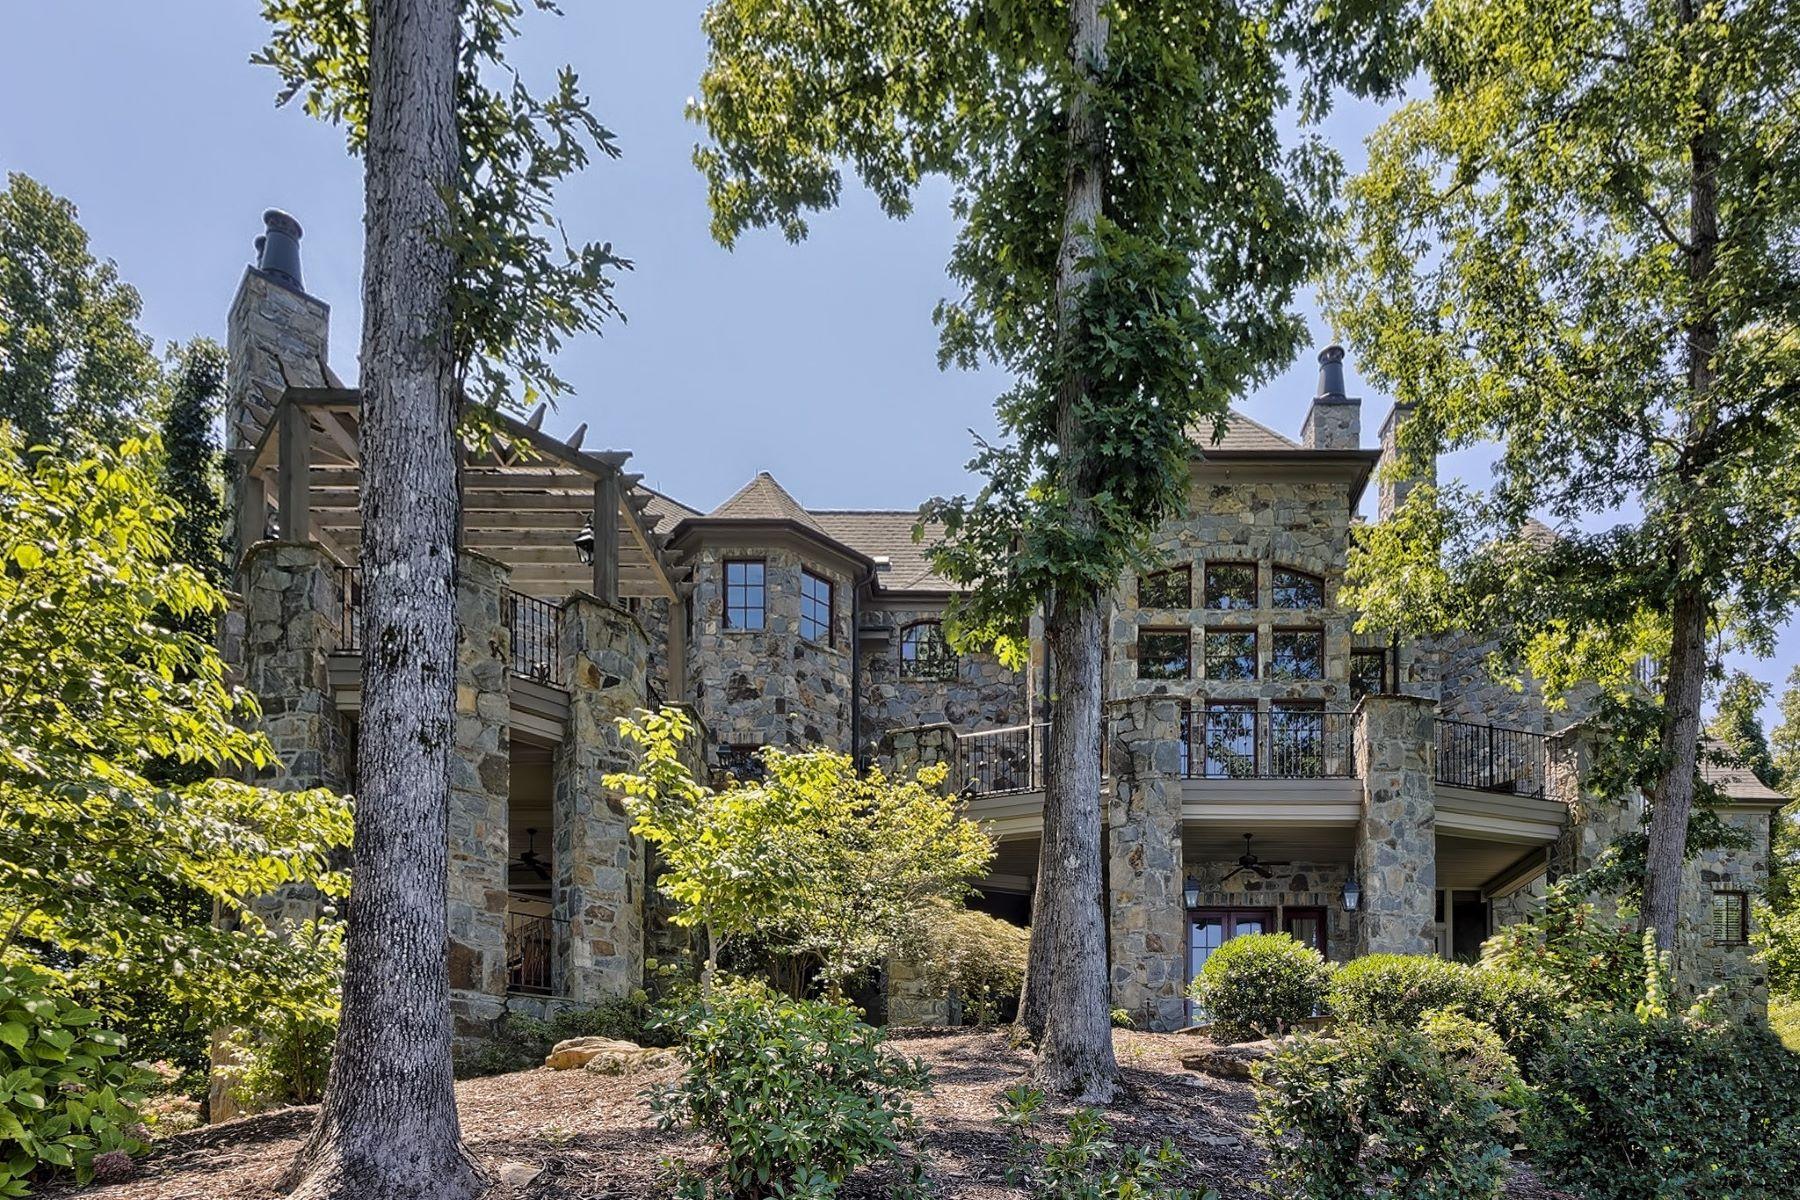 Single Family Home for Sale at Impressive & Tasteful Lakefront Home 235 Jasmine Point The Cliffs At Keowee Falls, Salem, South Carolina, 29676 United States